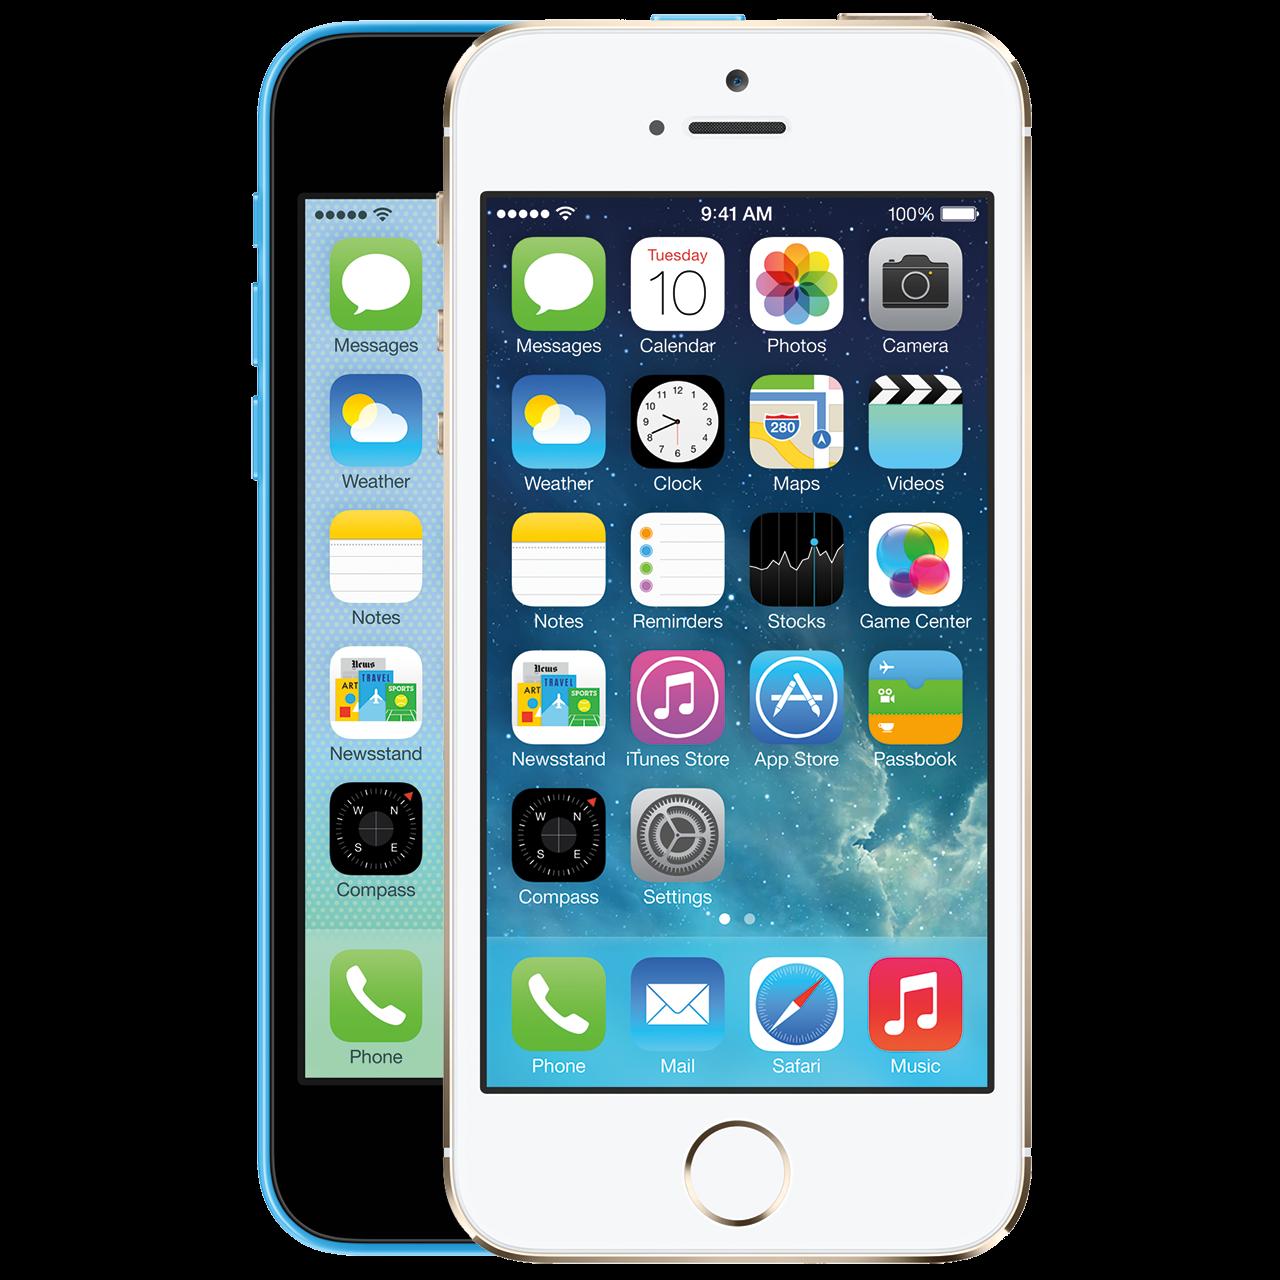 Www etradesupply com media uploaded iphone 5c vs iphone 5 screen jpg - Robotic Testing Finds Touchscreen Inaccuracies At Edge Of Iphone Display Ihash